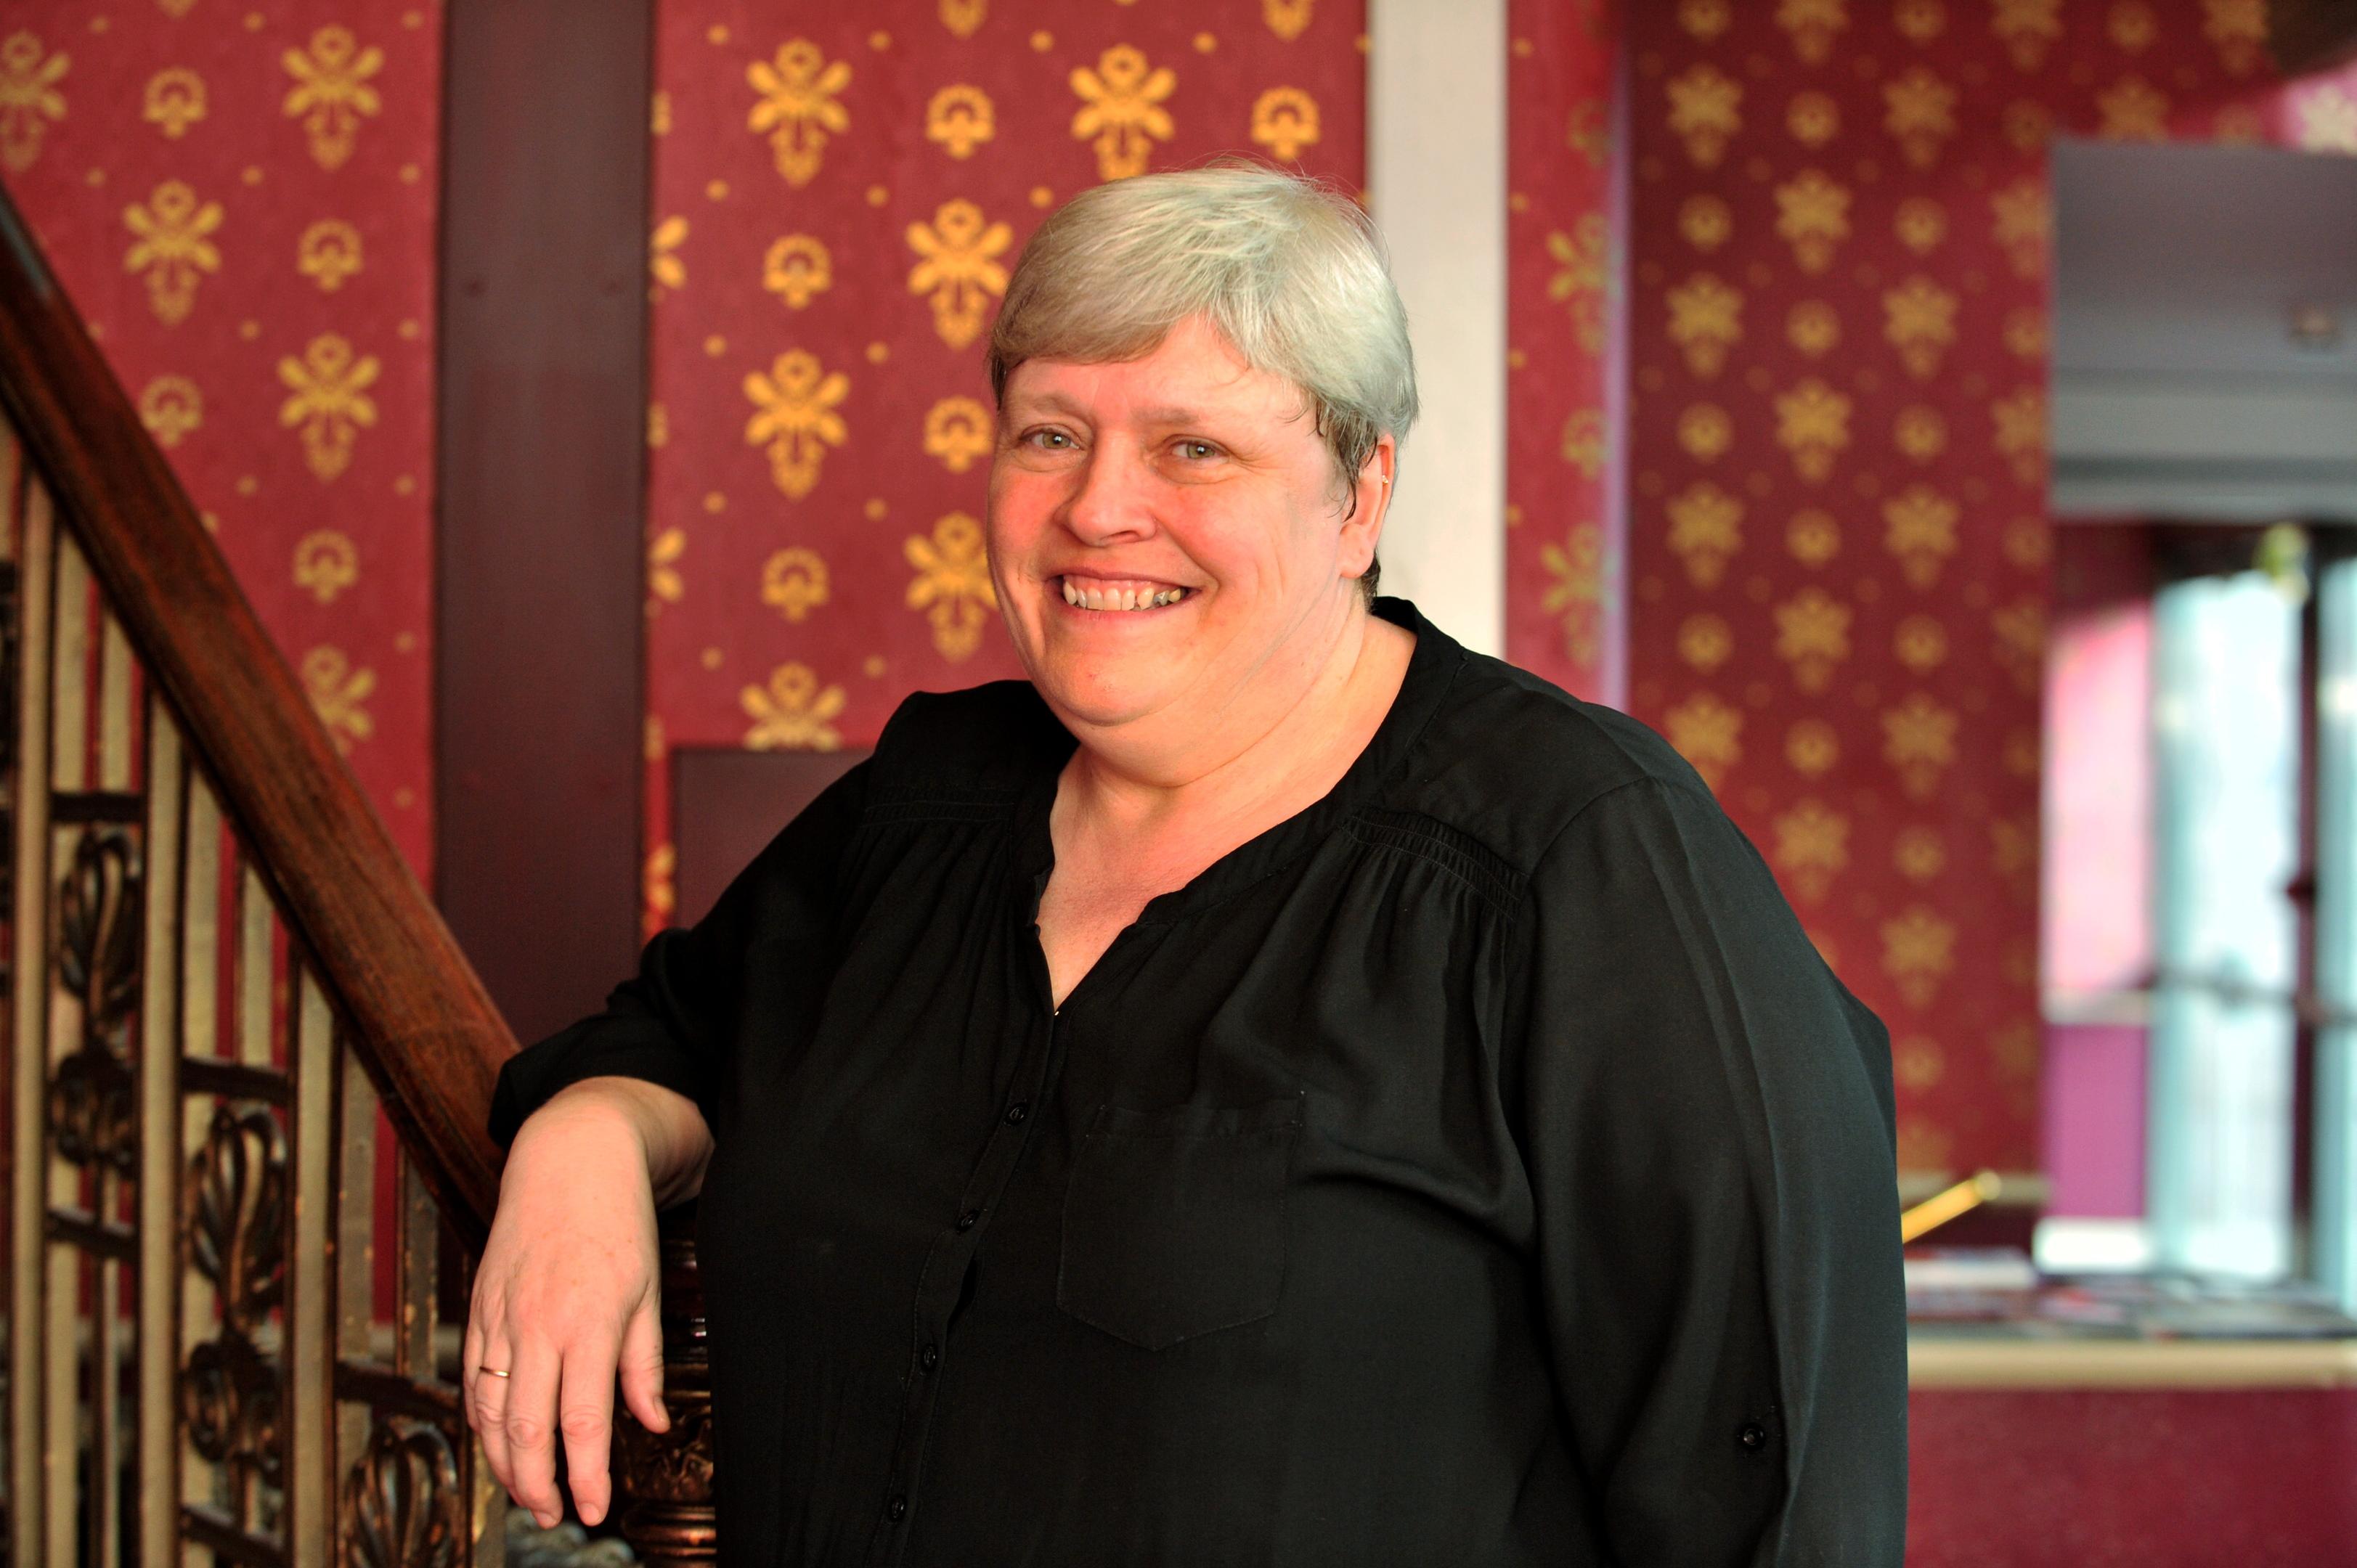 Lesley Crerar translates theatre shows into sign language.